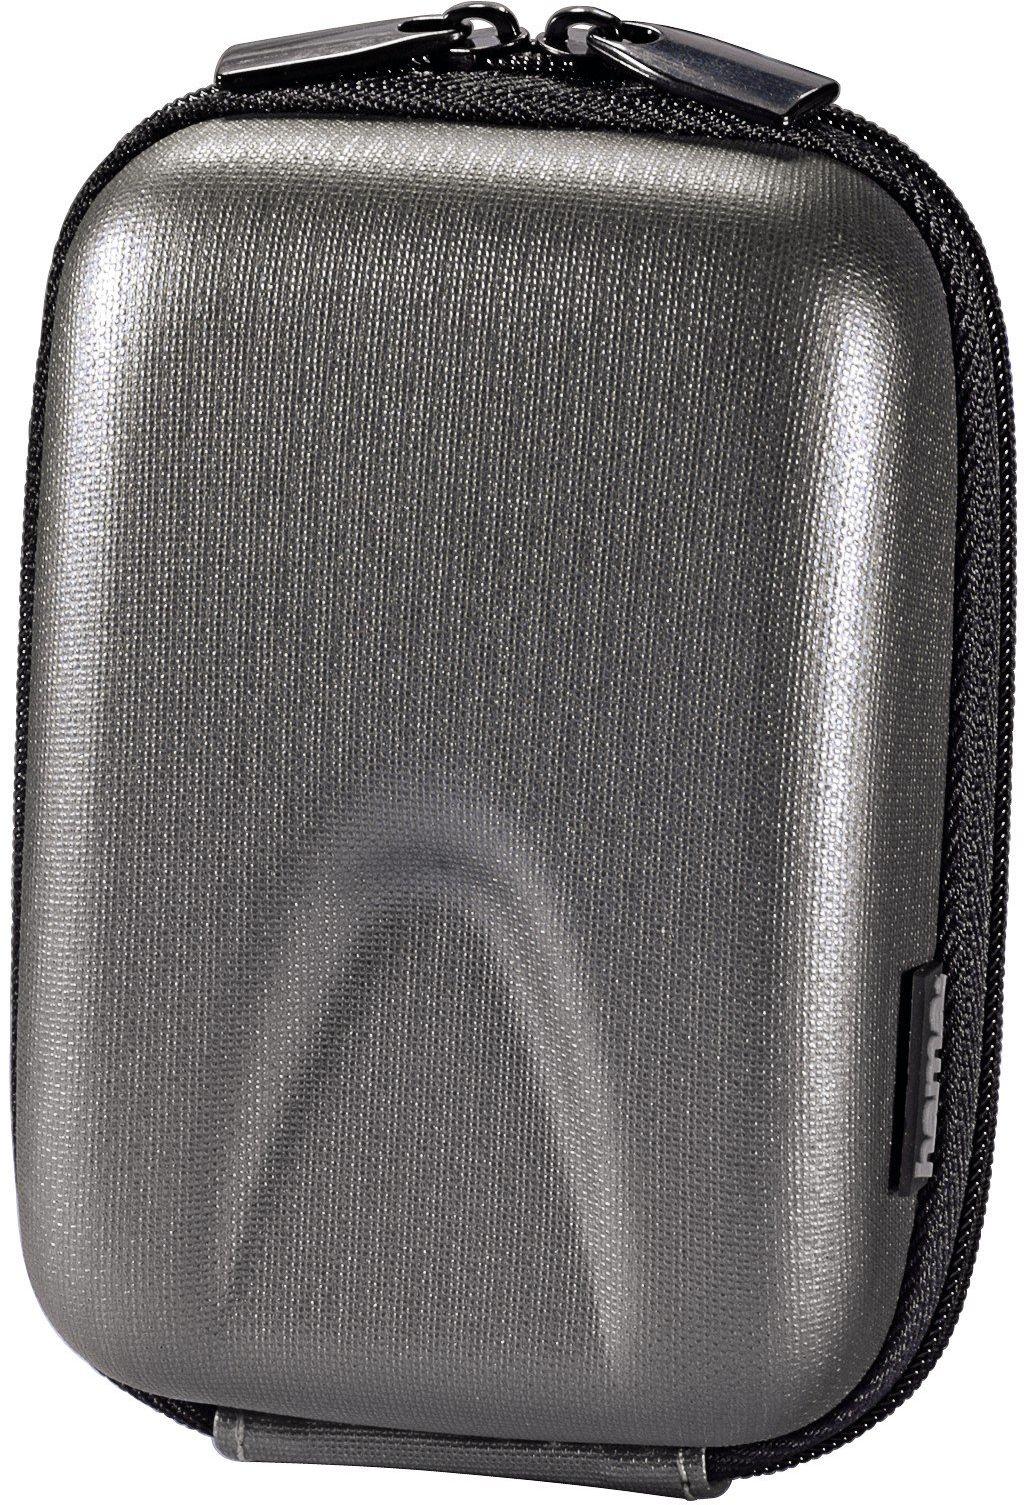 Hama Hardcase Thumb 60 L torba na aparat srebrna